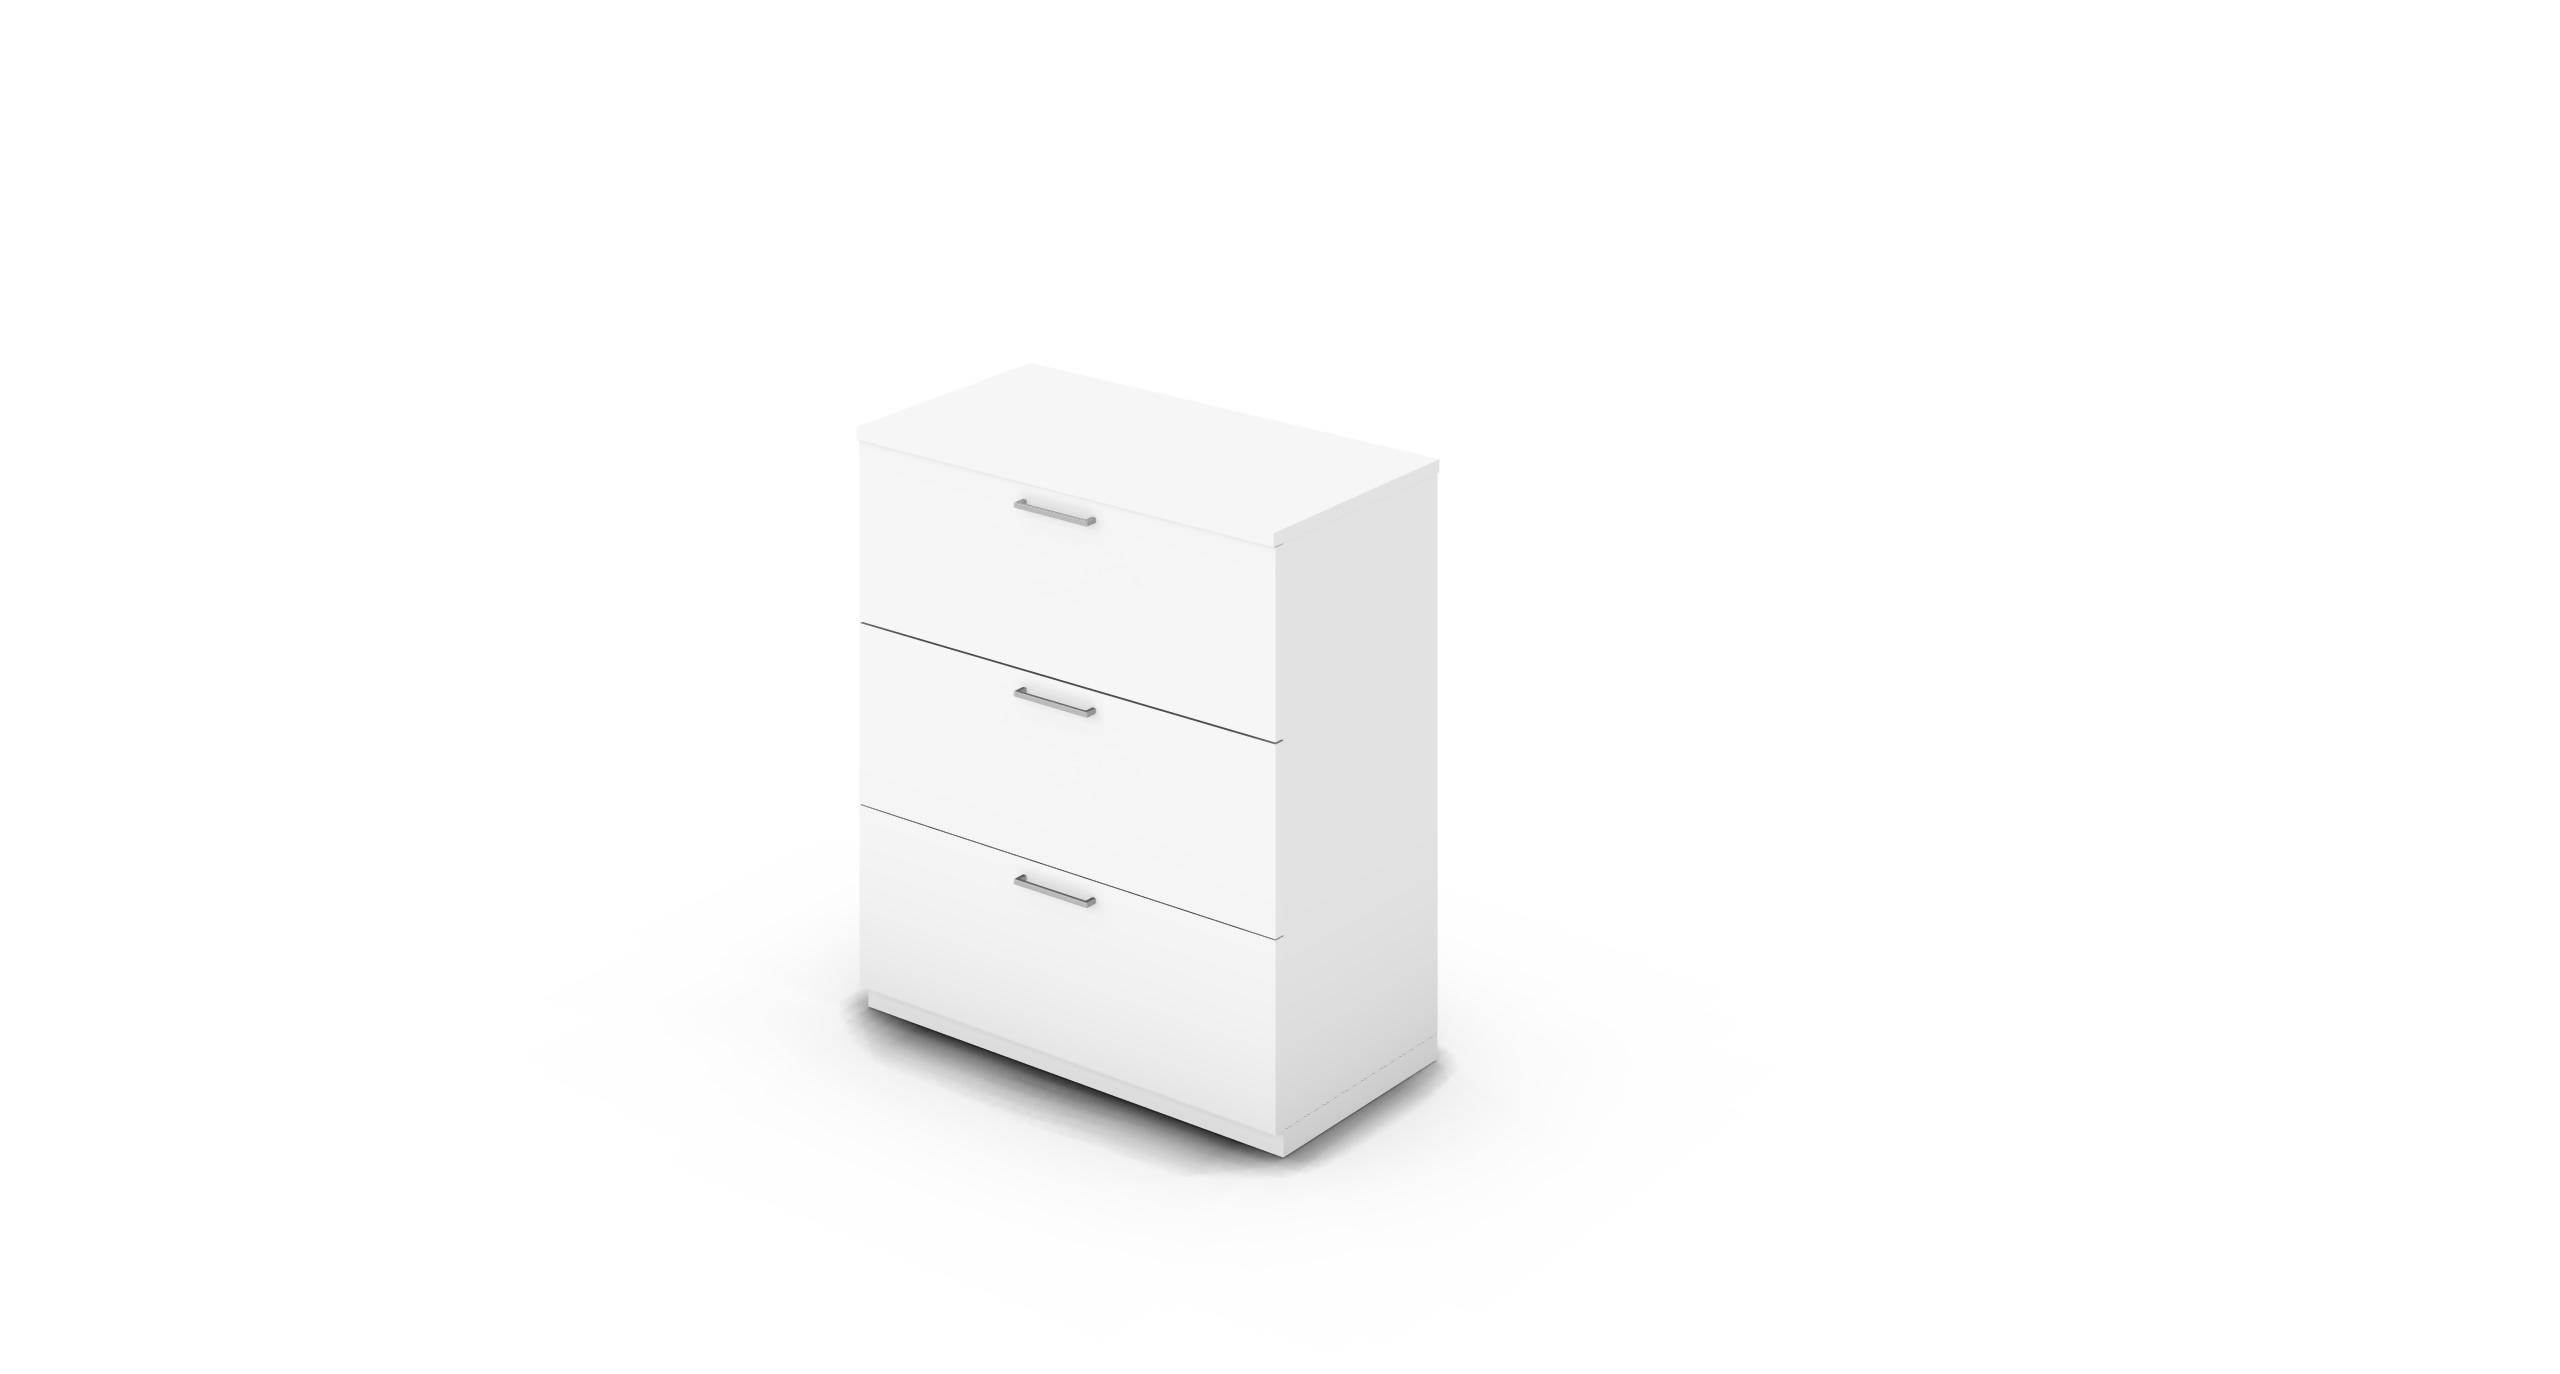 Cabinet_900x450x1125_DR_White_Bar_Square_NoCylinder